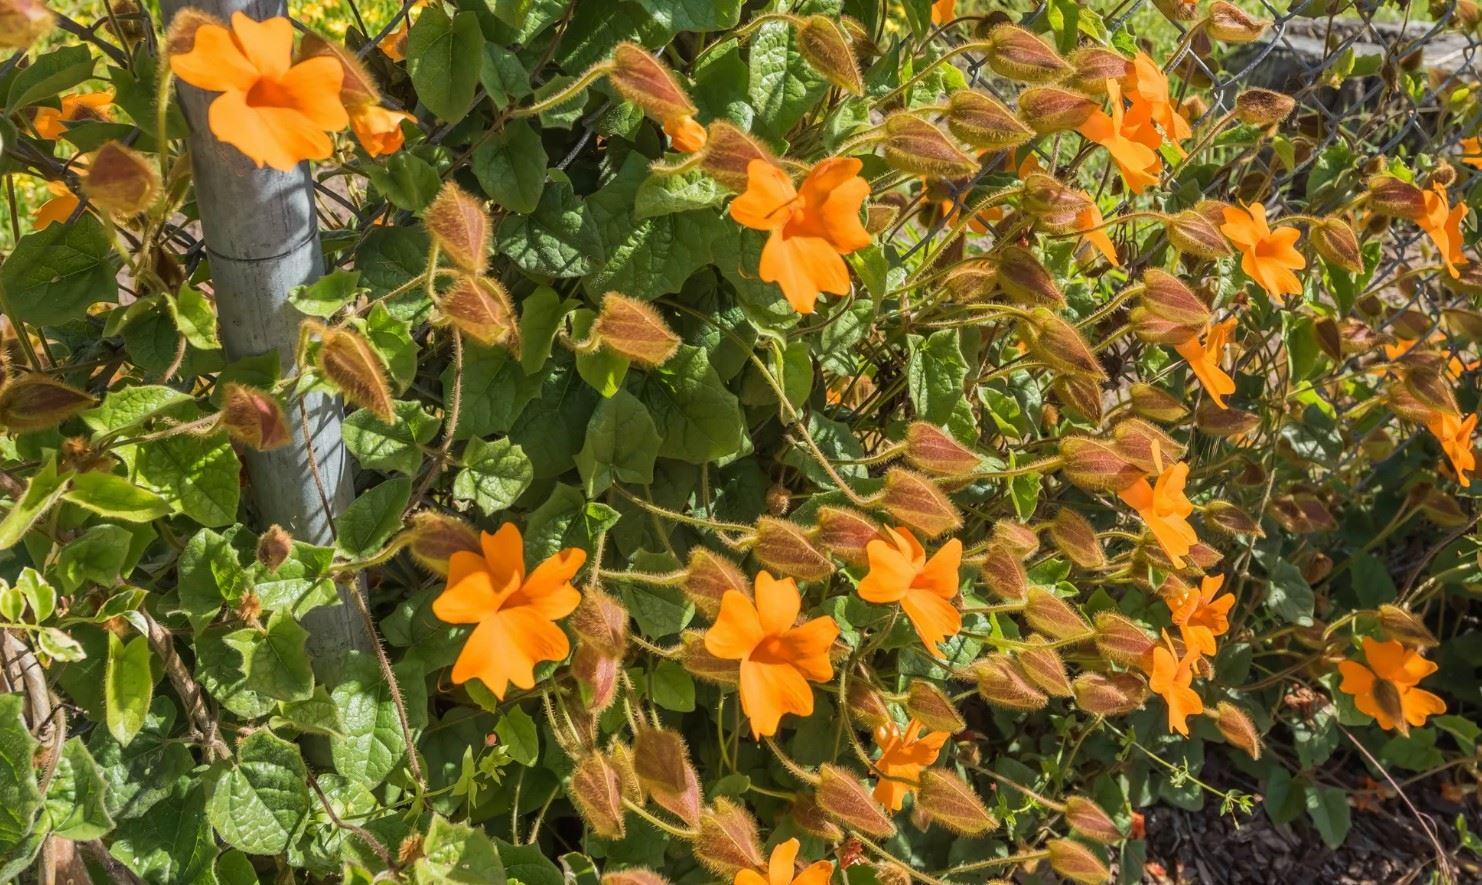 Morro Bay Rock Revival - Exterior - Close up on flowering vines in backyard